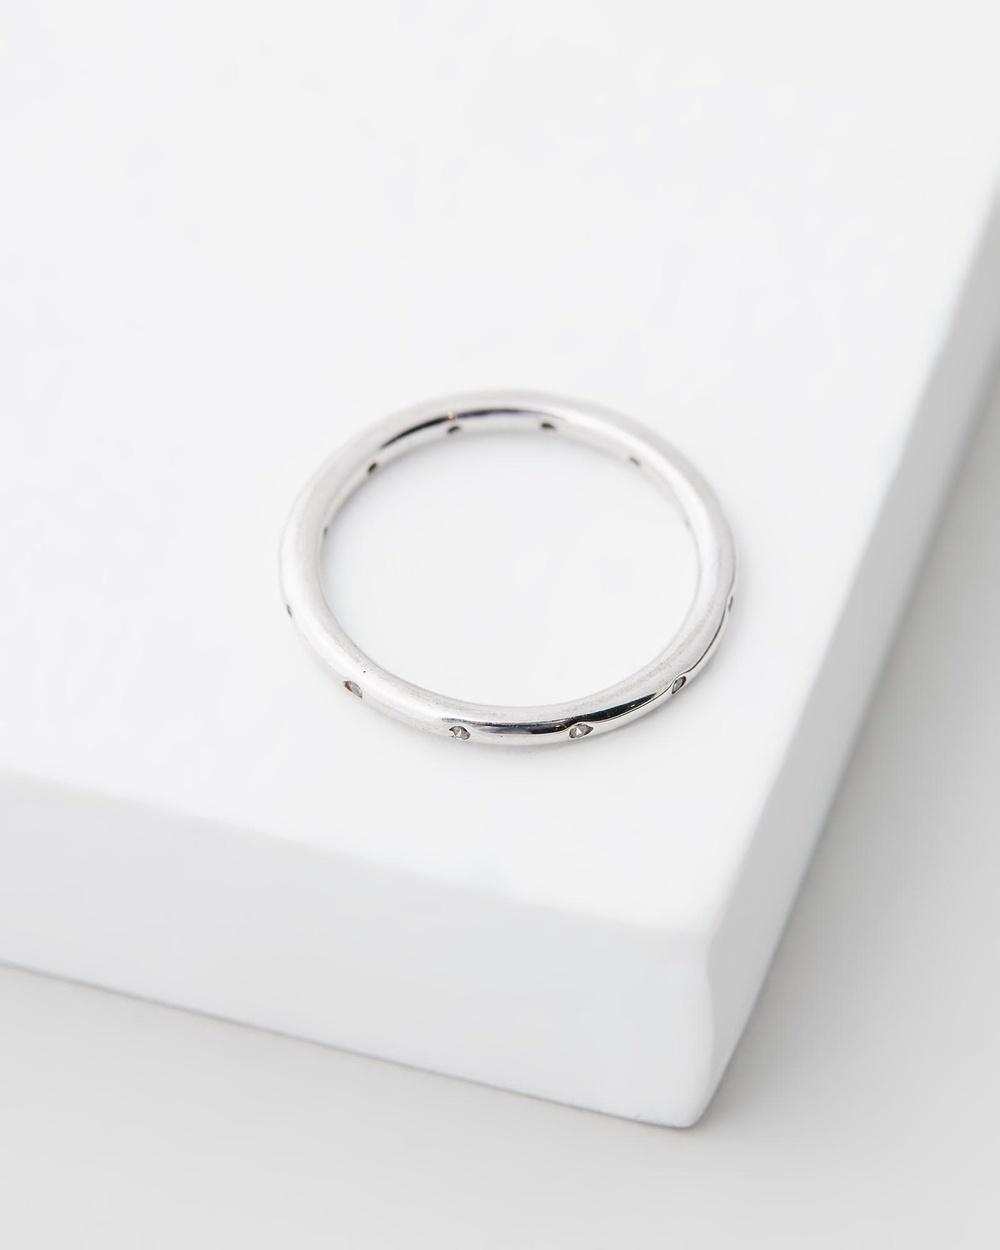 SAINT VALENTINE Constellation Ring Jewellery Silver